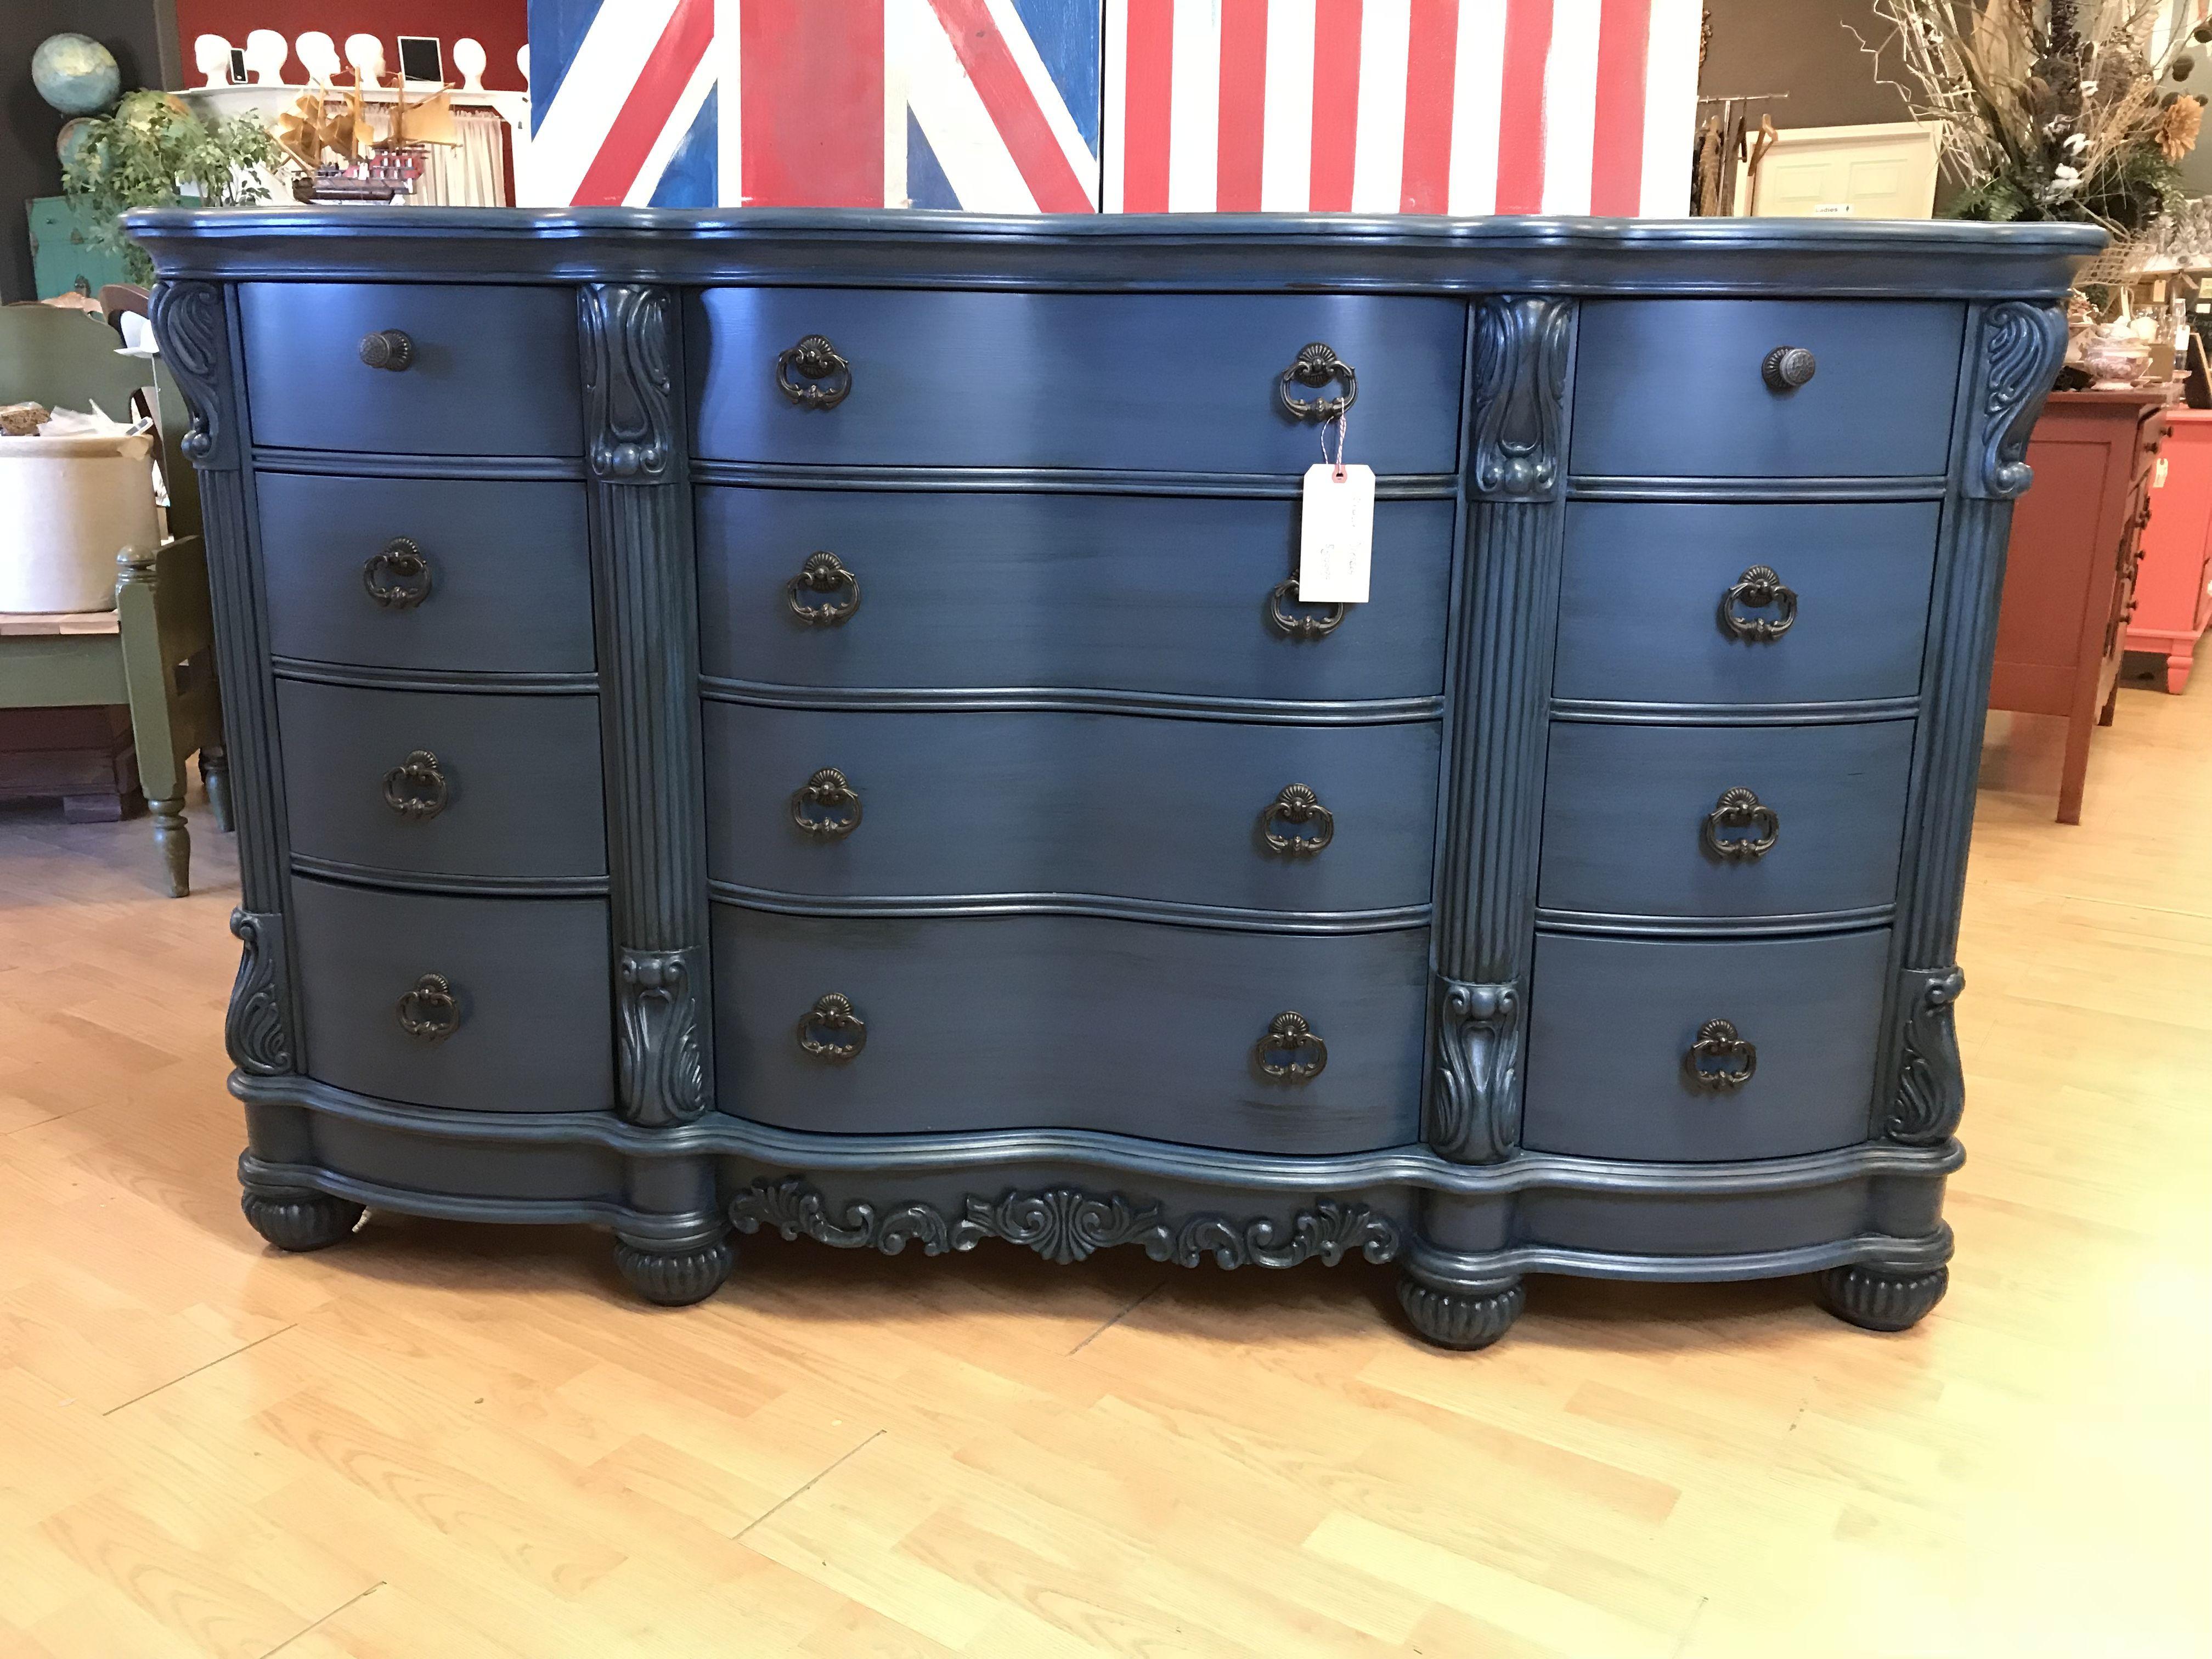 Europa Collezione Dresser Buffet By Carol House Furniture Company